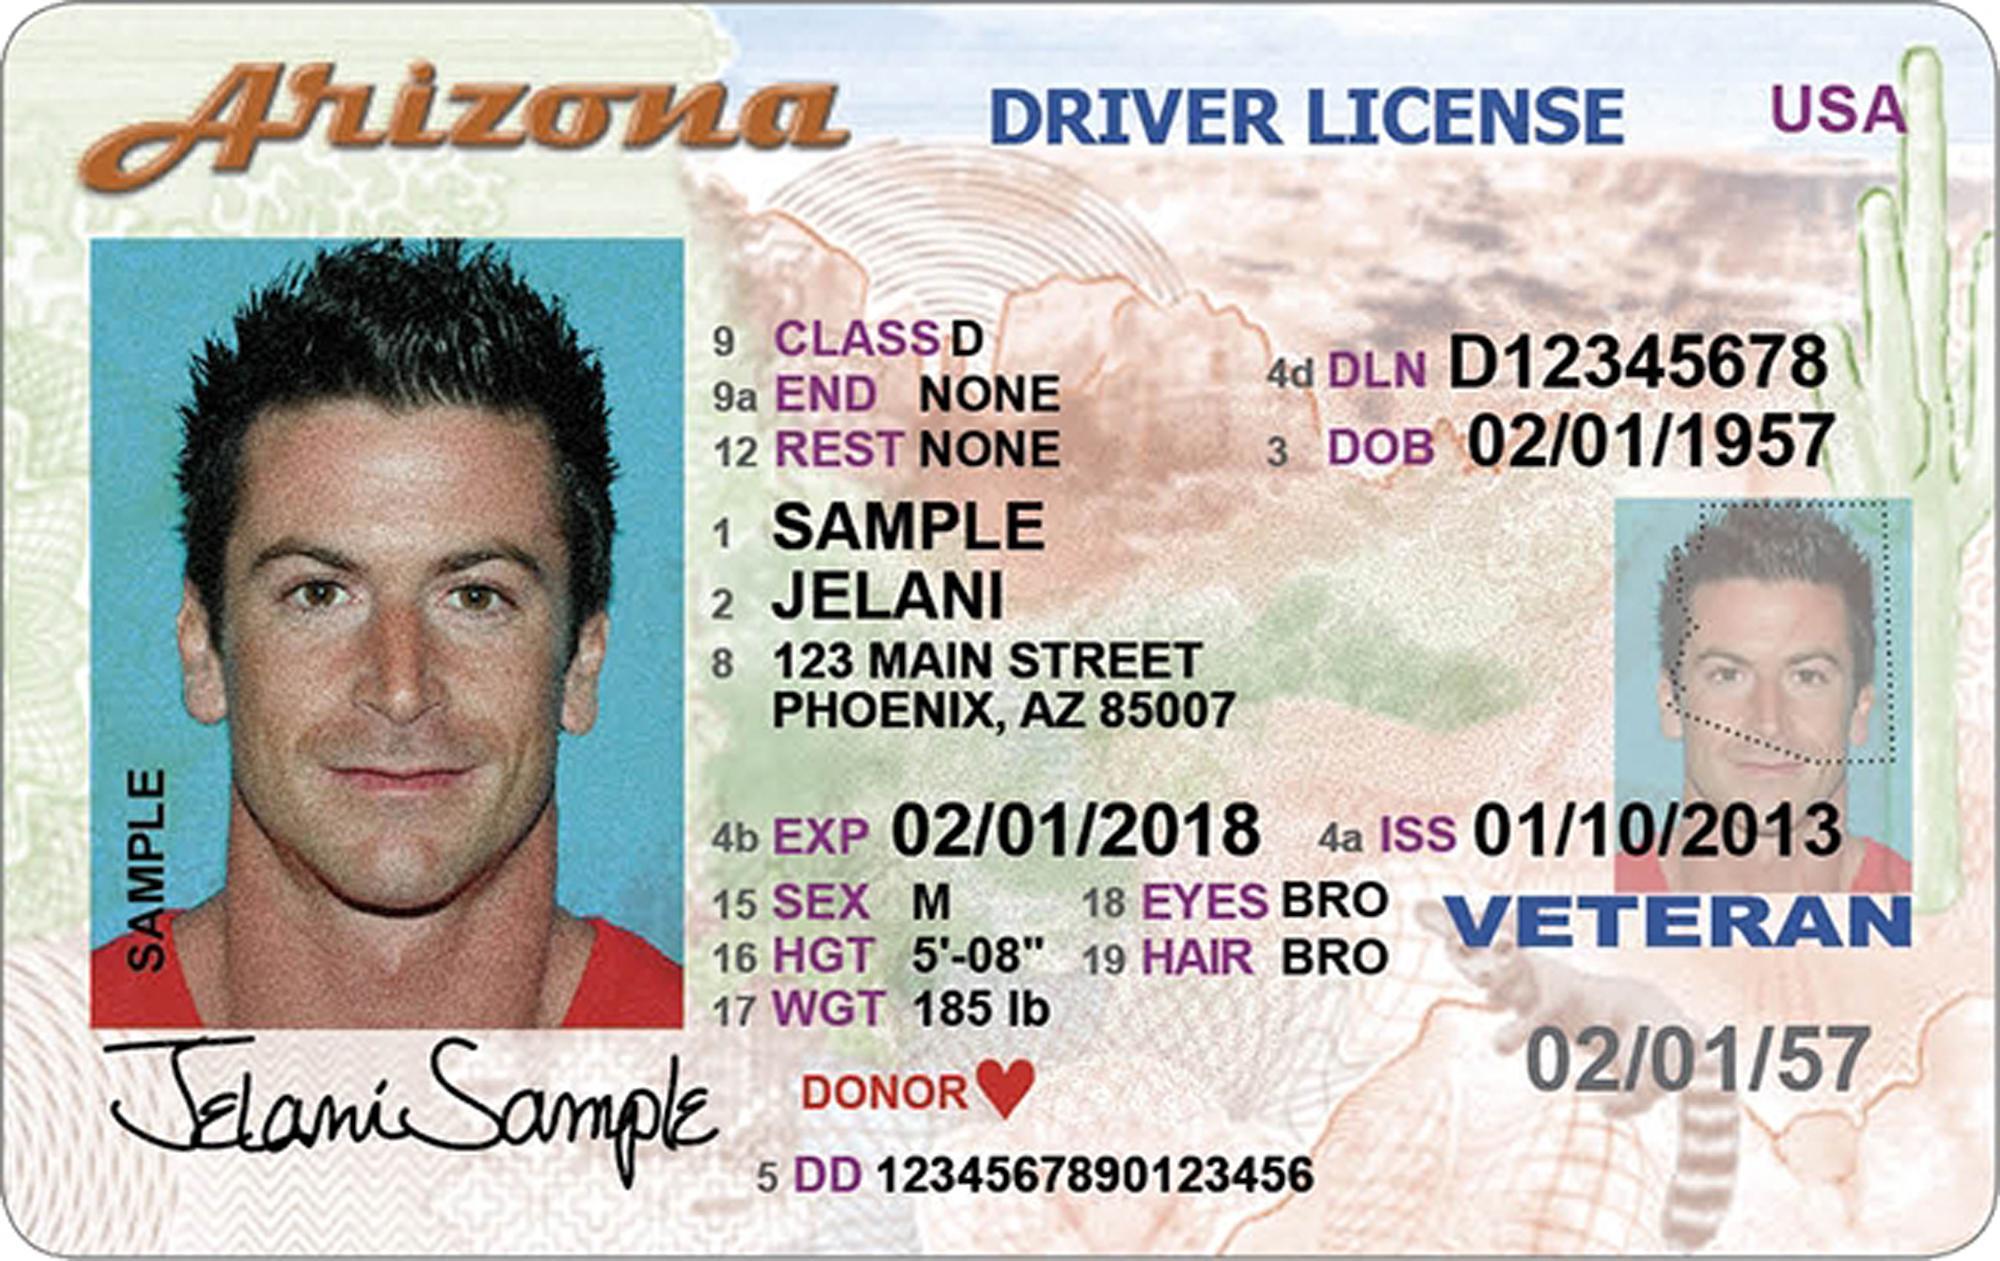 From Times To Fraudsters Ids Arizona Washington Ramps Biometric Keep - Program Up